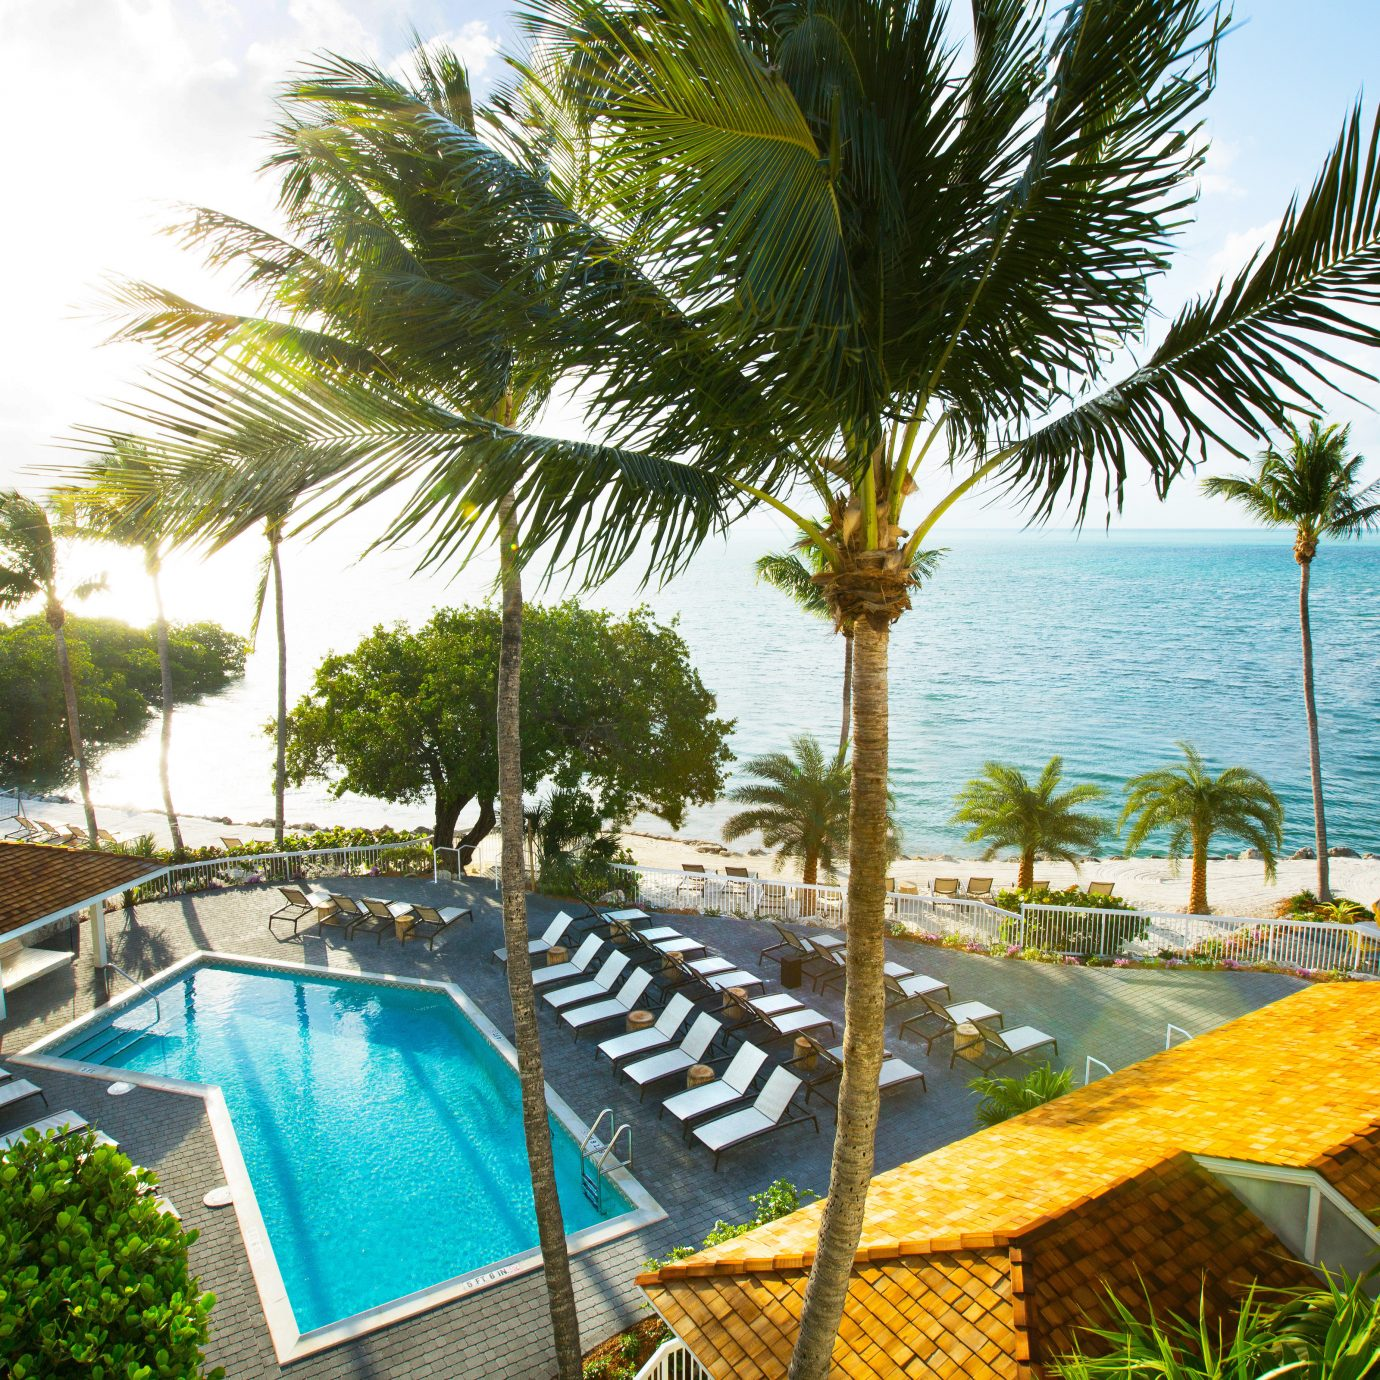 Beach Beachfront Pool Resort tree palm sky umbrella property leisure swimming pool chair caribbean arecales lawn Villa plant palm family tropics condominium shade Garden